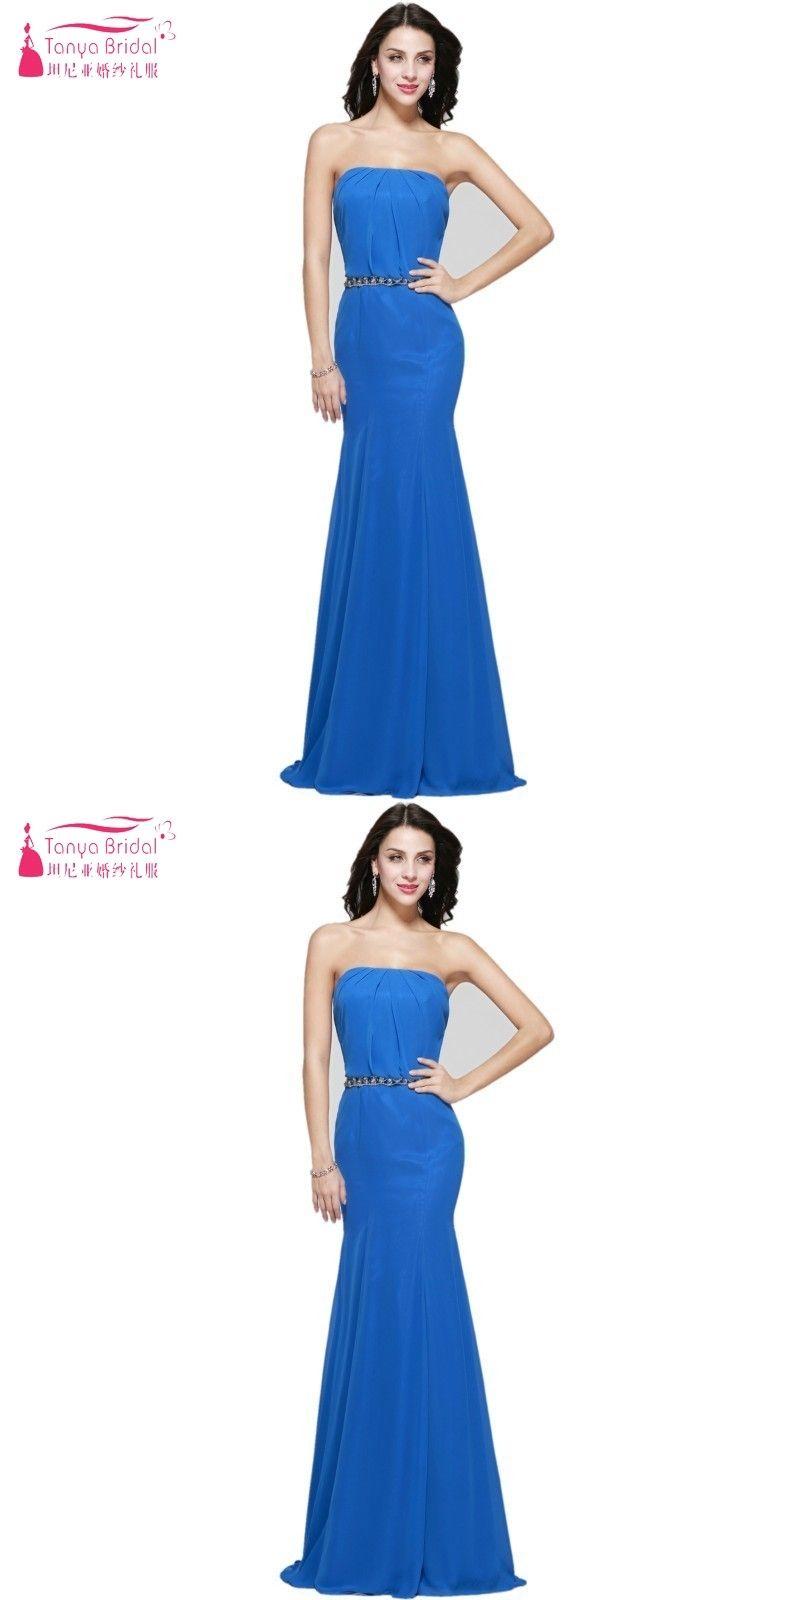 Strapless mermaid long chiffon bridesmaid dress with crystal belt on